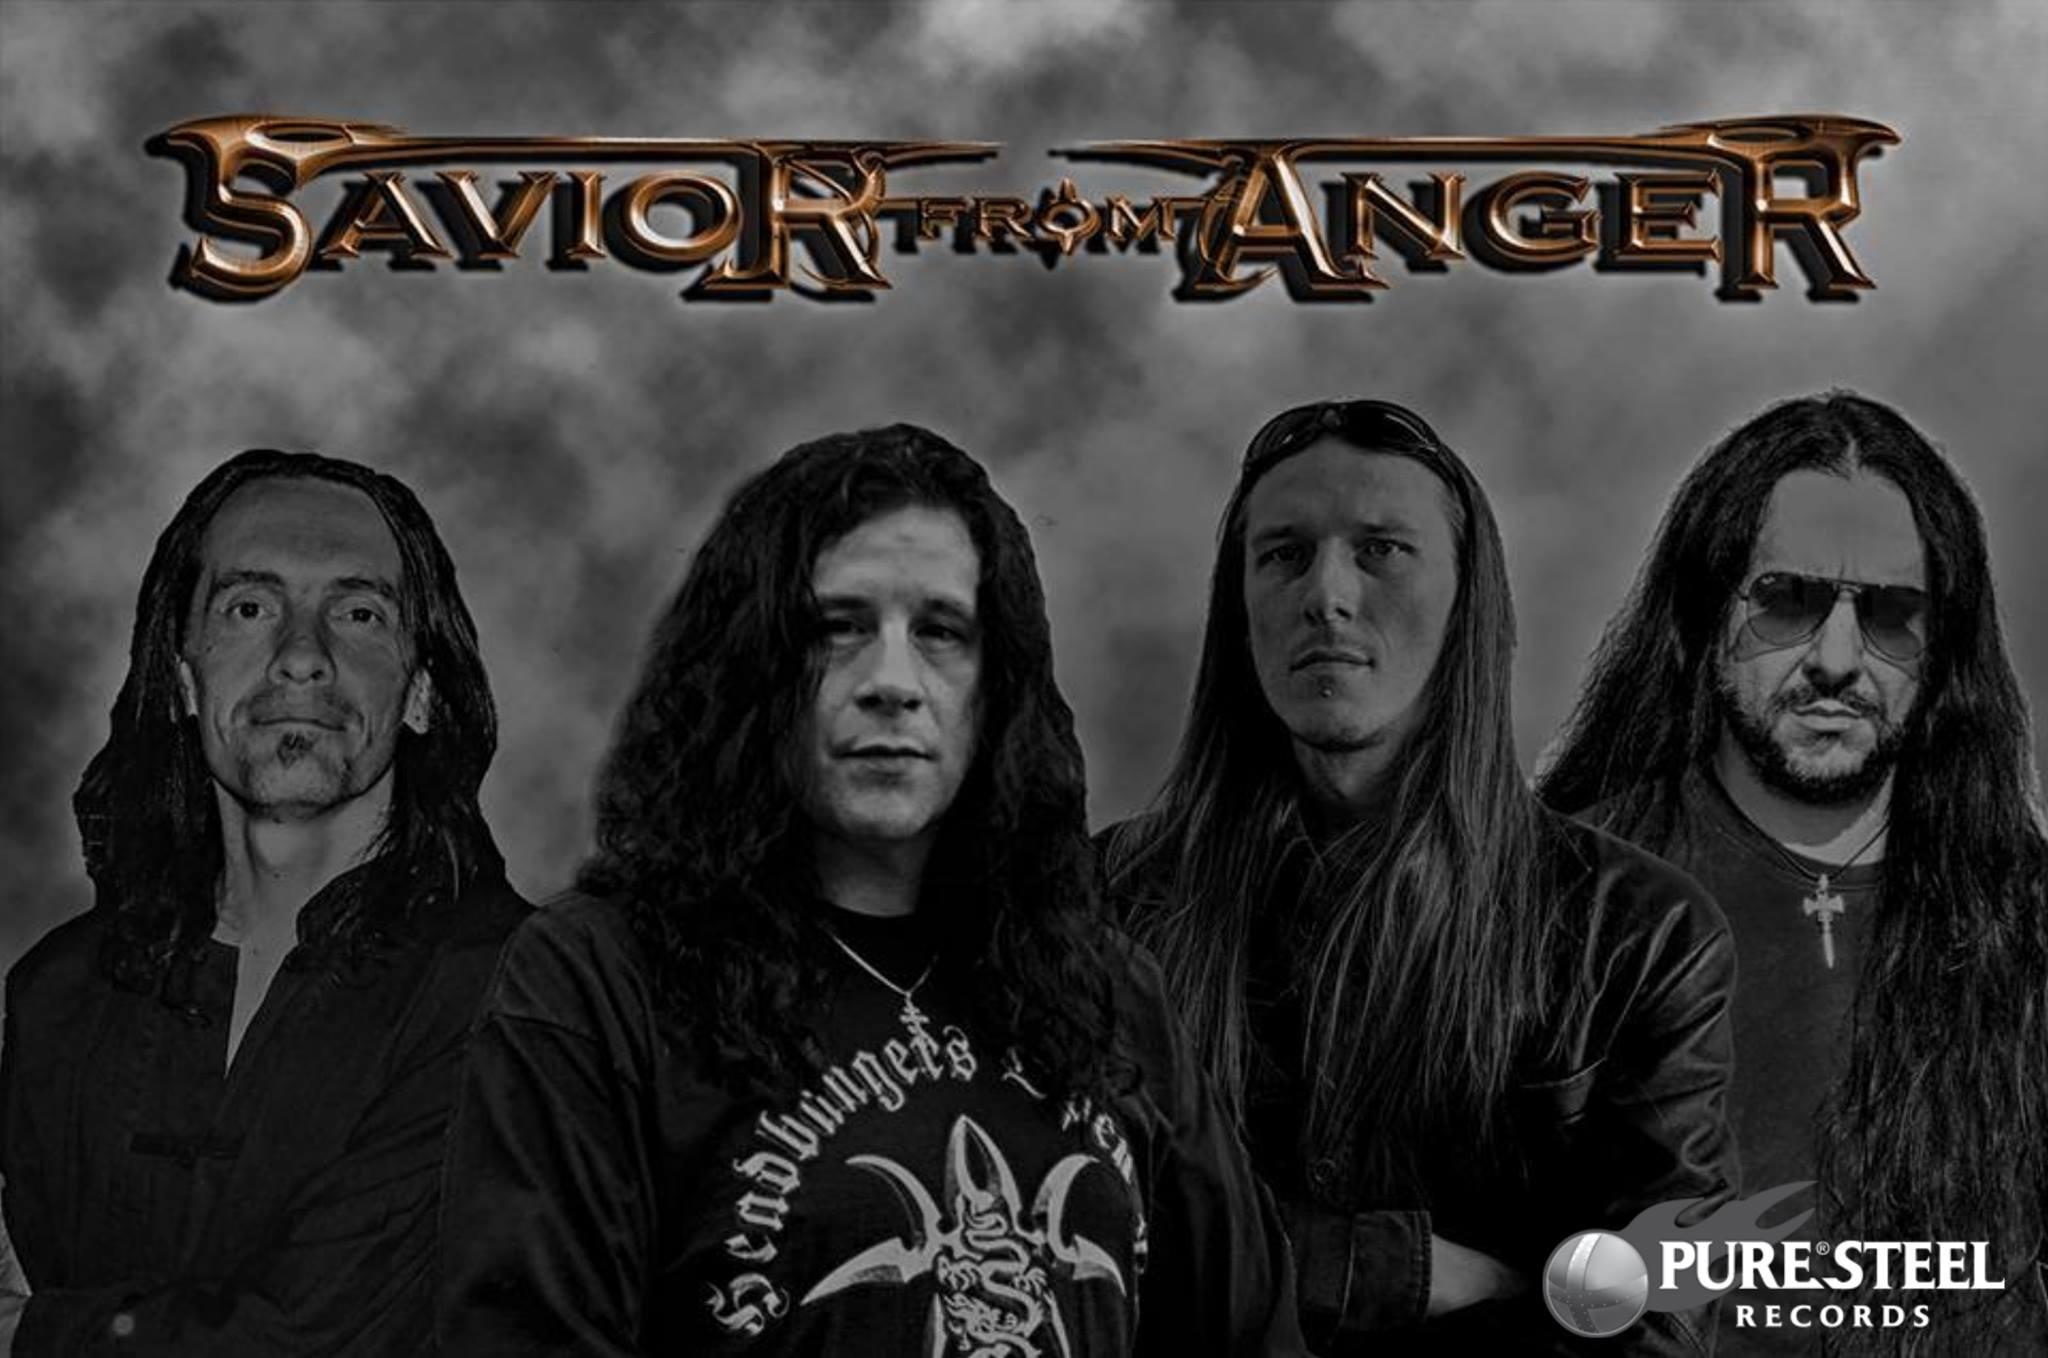 Savior from Anger - Photo